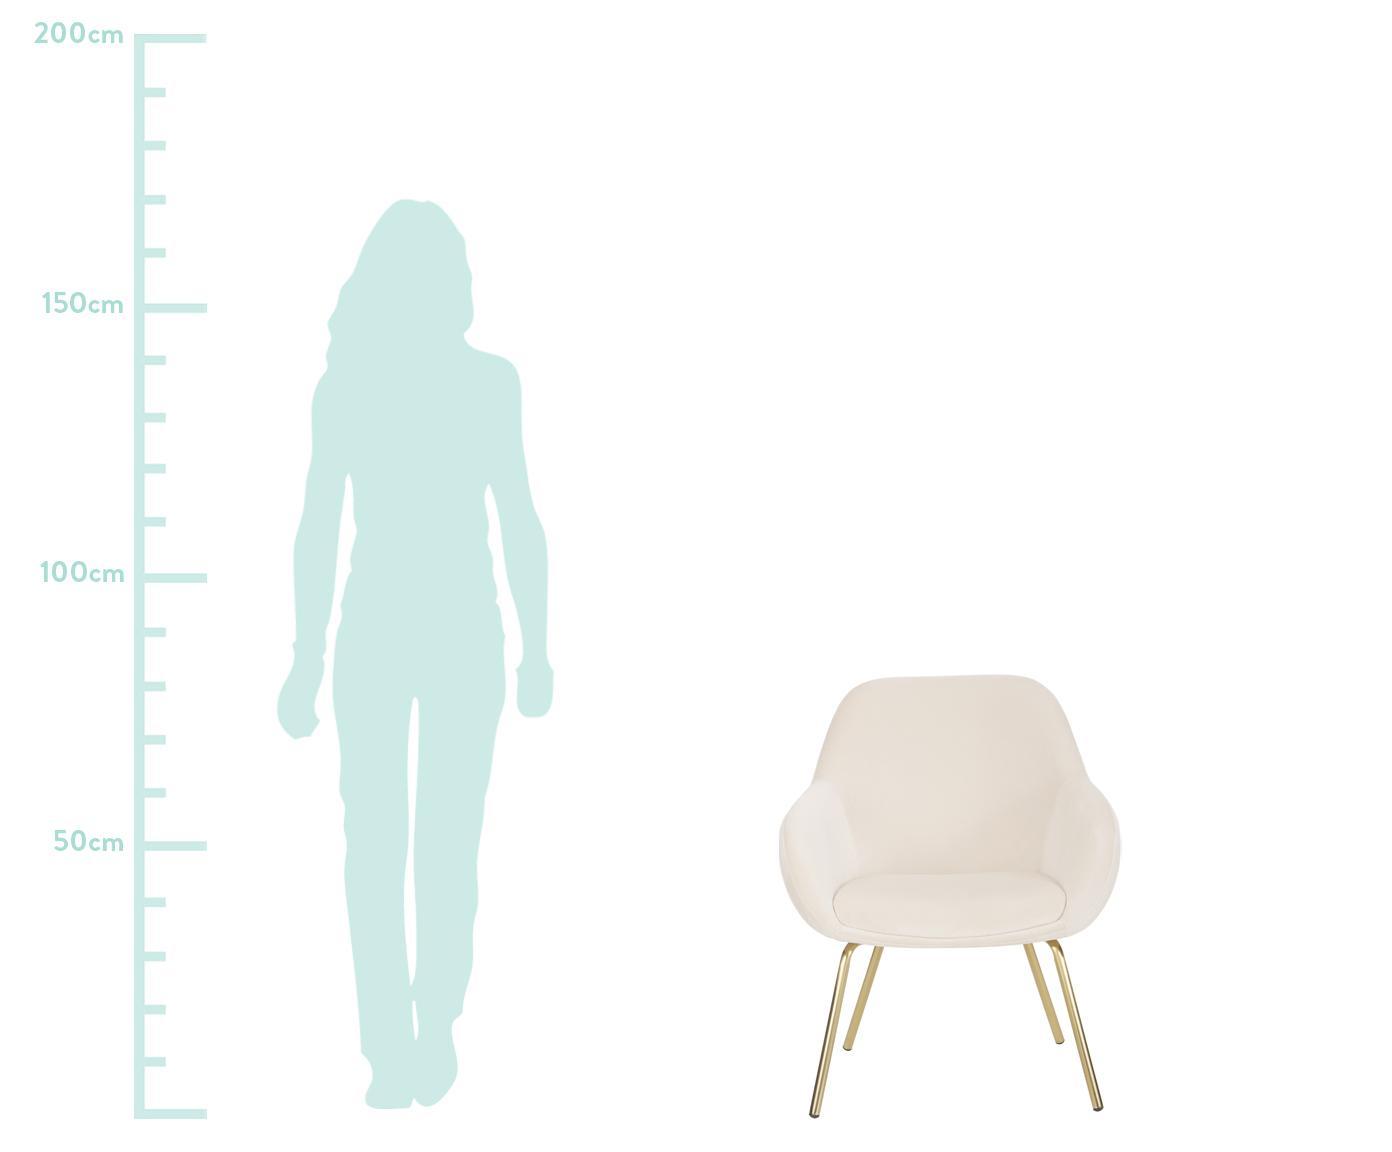 Fluwelen fauteuil Jana, Bekleding: fluweel (polyester), Poten: gelakt metaal, Crèmewit, B 72 x D 68 cm